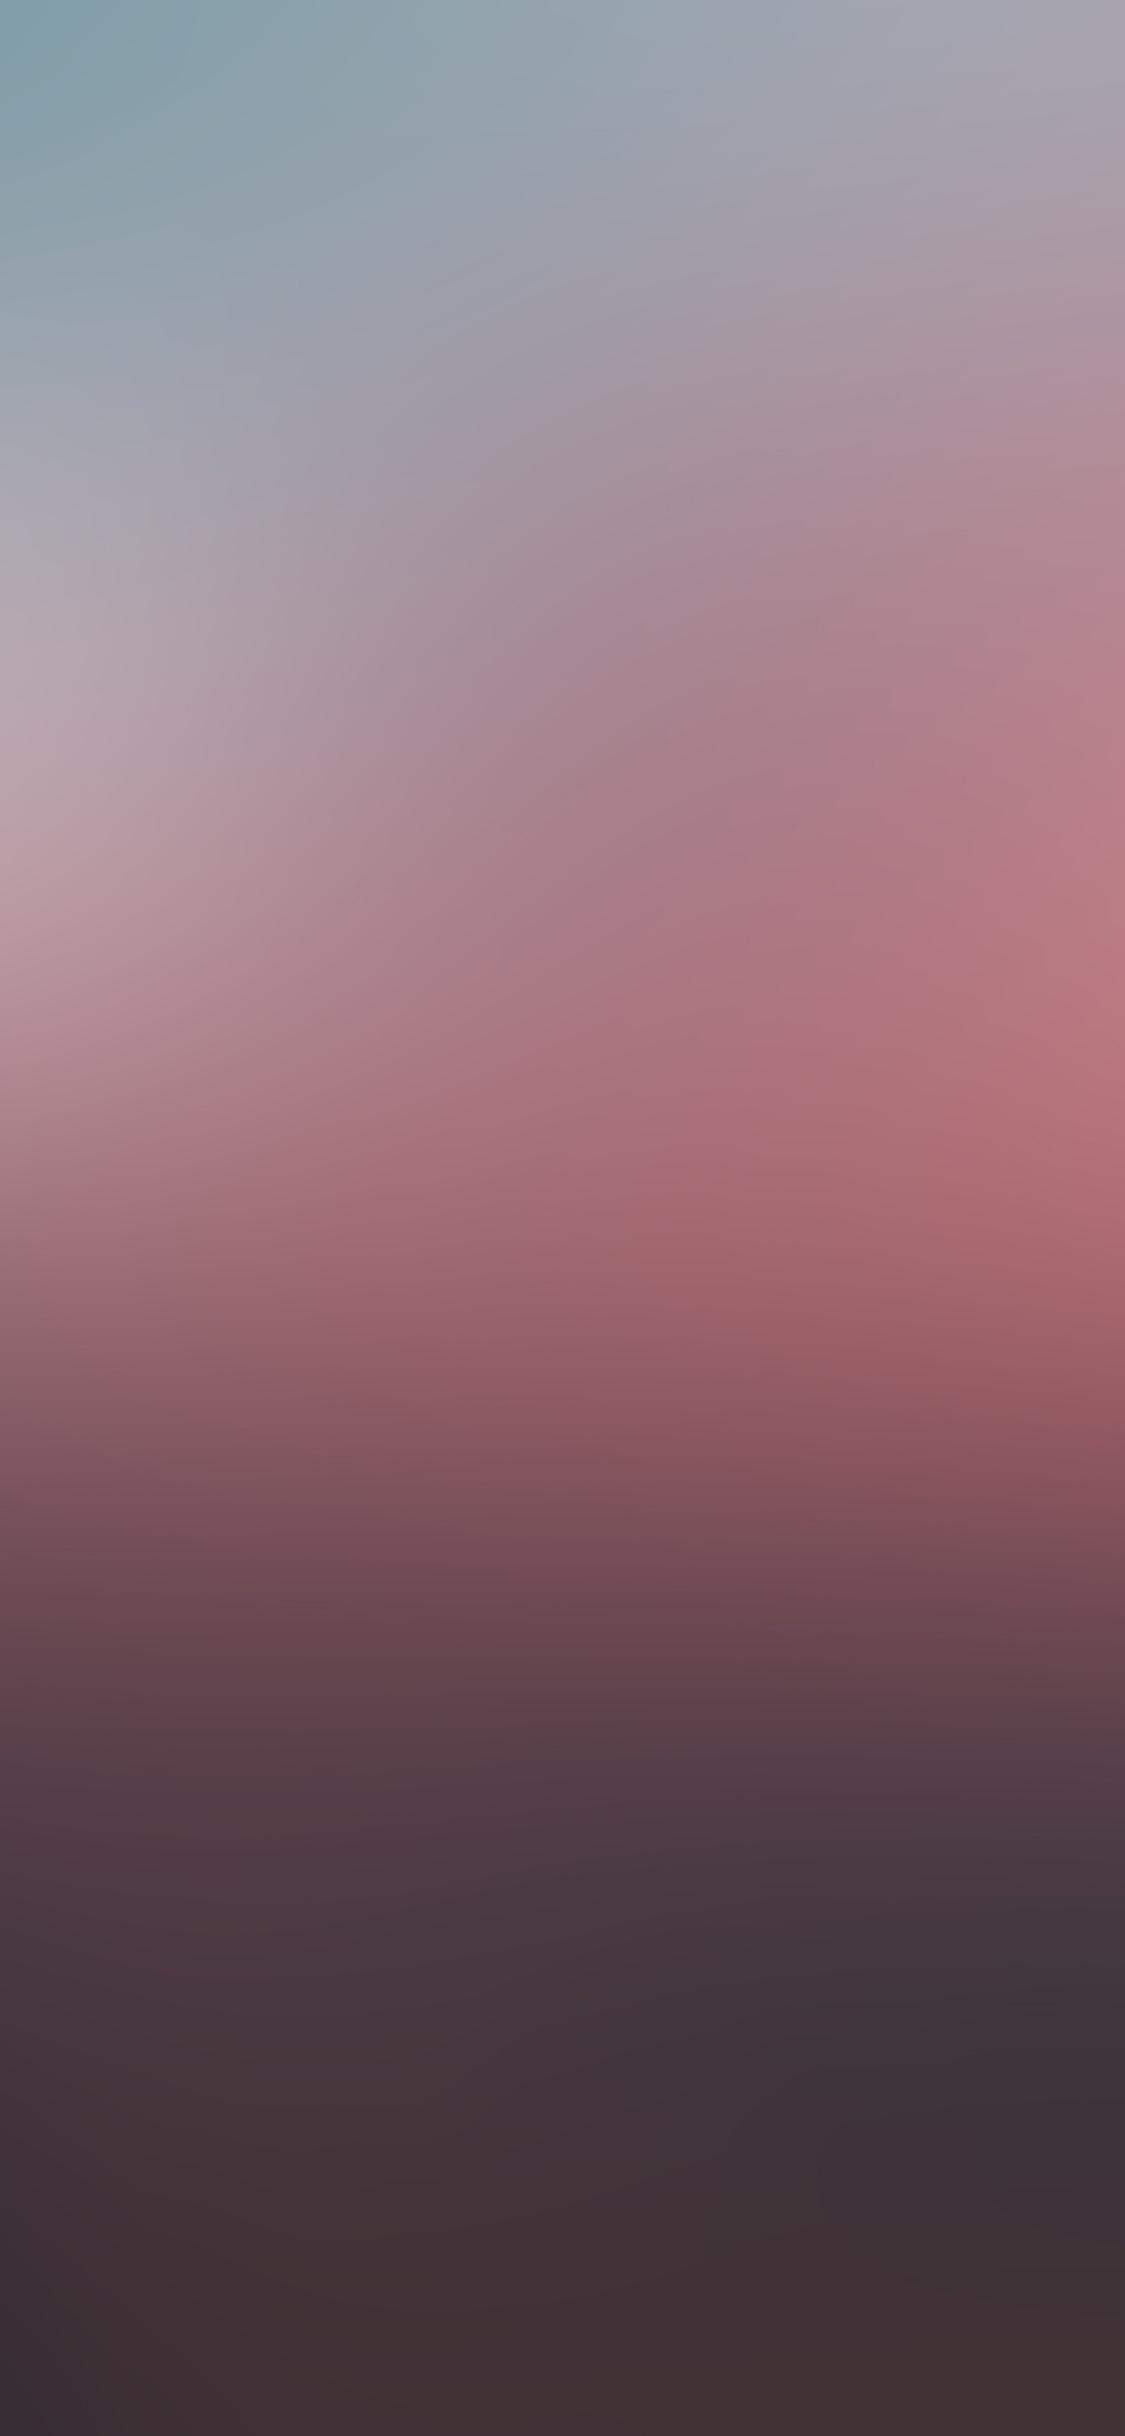 iPhoneXpapers.com-Apple-iPhone-wallpaper-sl04-pink-cloud-blur-gradation